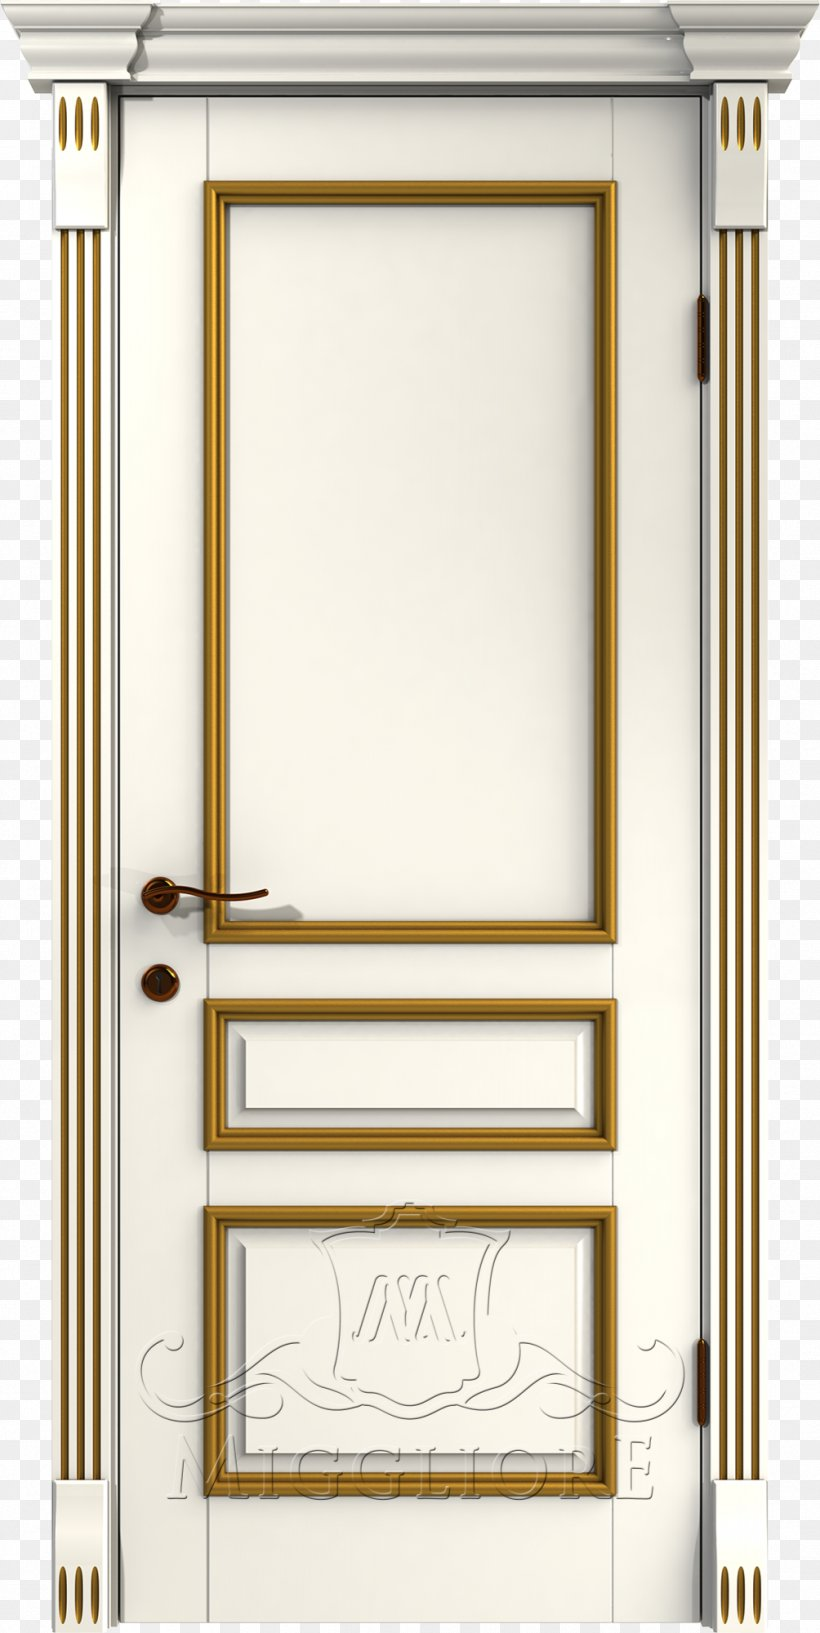 Door Wood Enamel Paint Miggliore Glued Laminated Timber Png 1004x2000px Door Bathroom Color Enamel Paint Glued